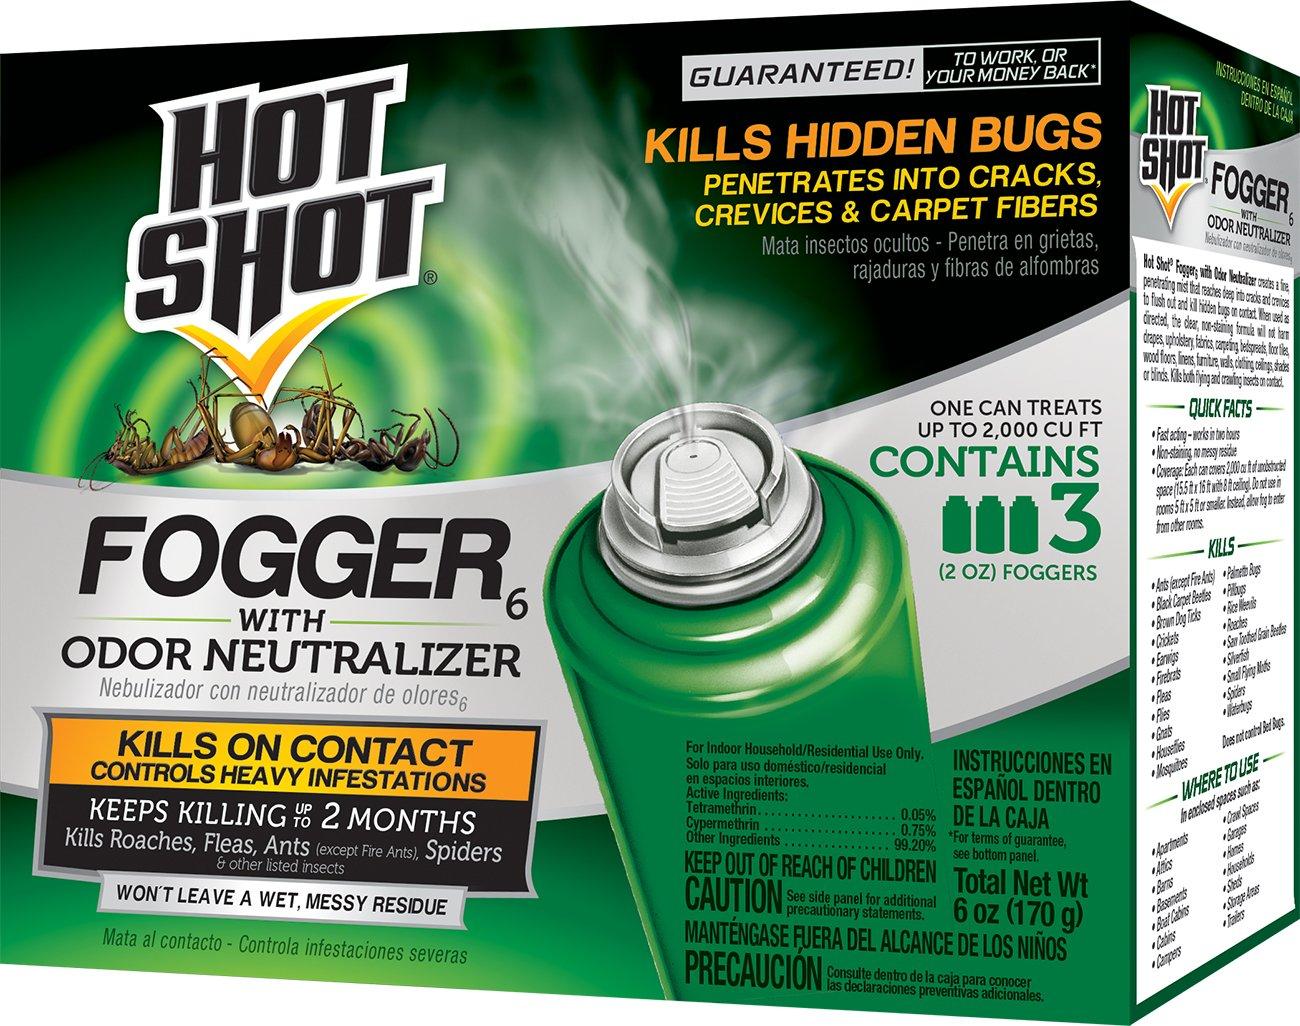 Hot Shot 66180 Indoor Fogger, 3-Count, 6-Pack